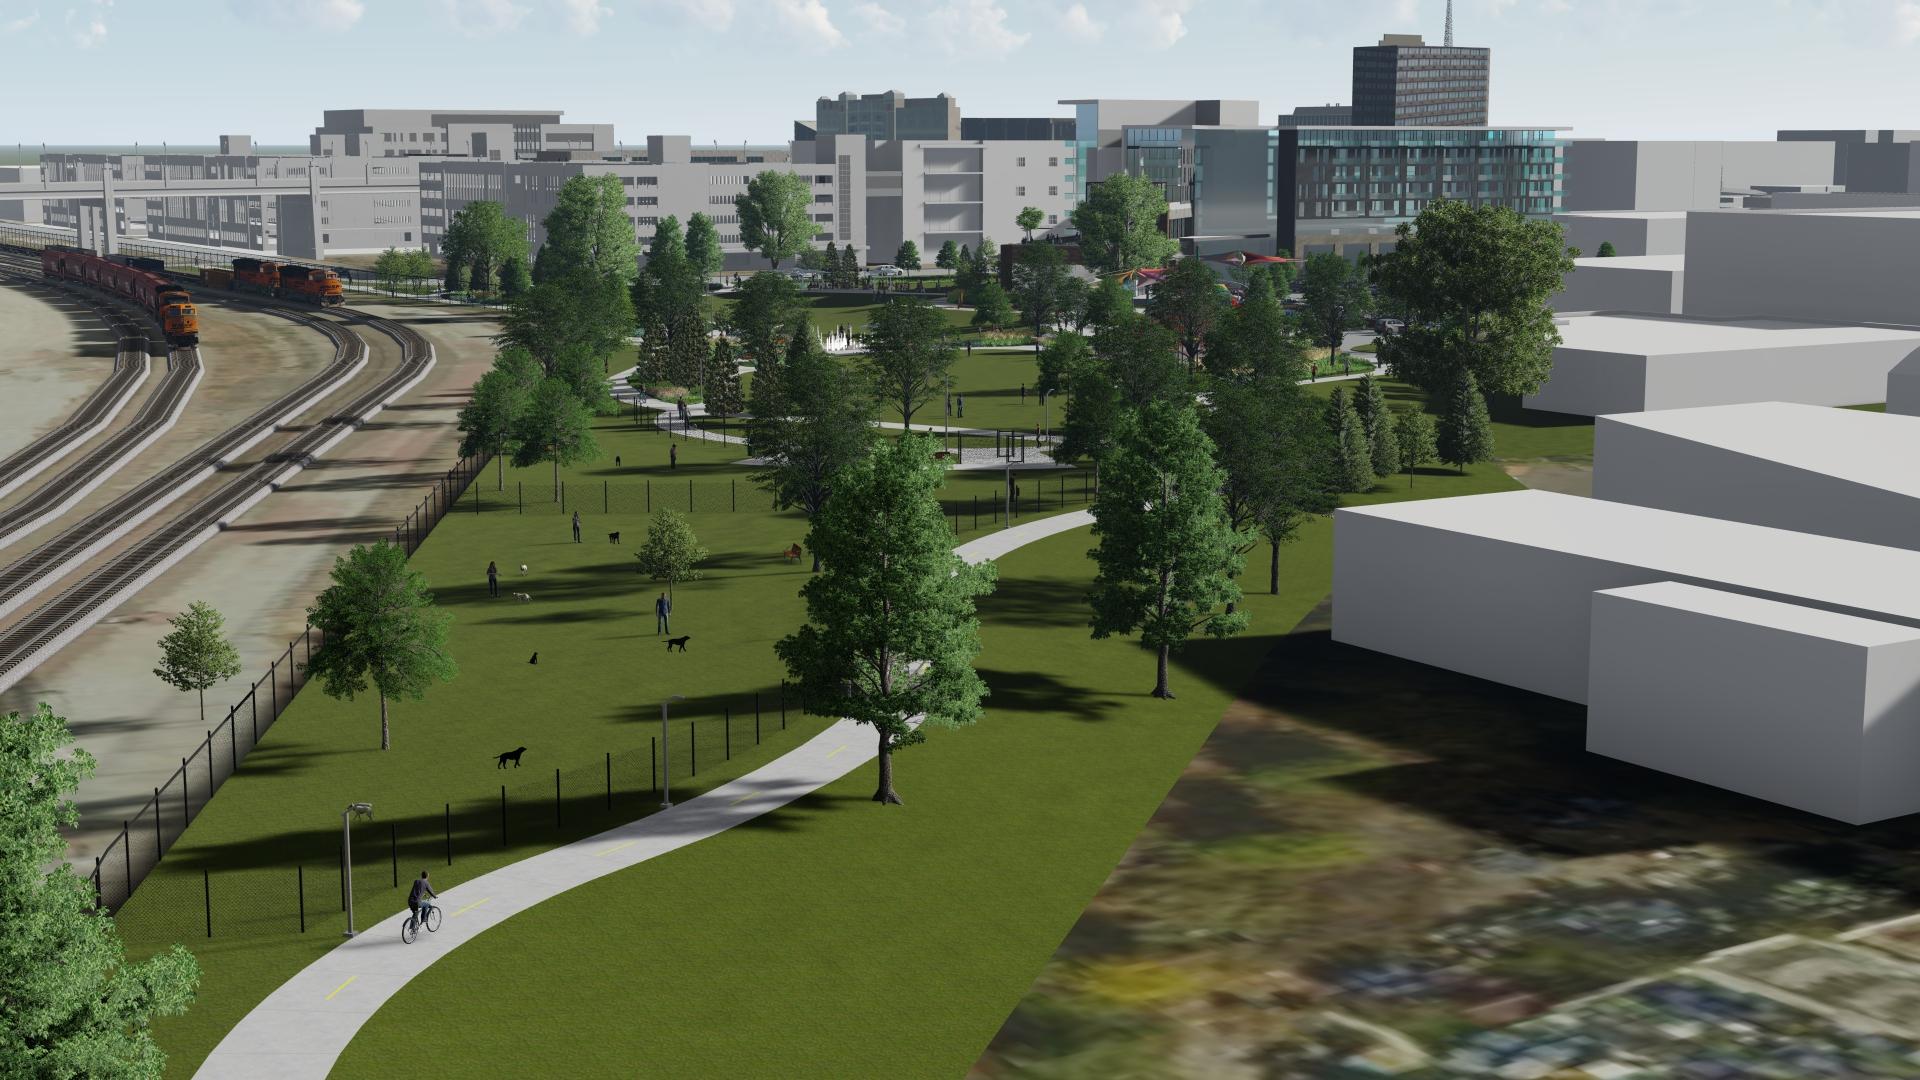 South Haymarket Park & Plaza Survey